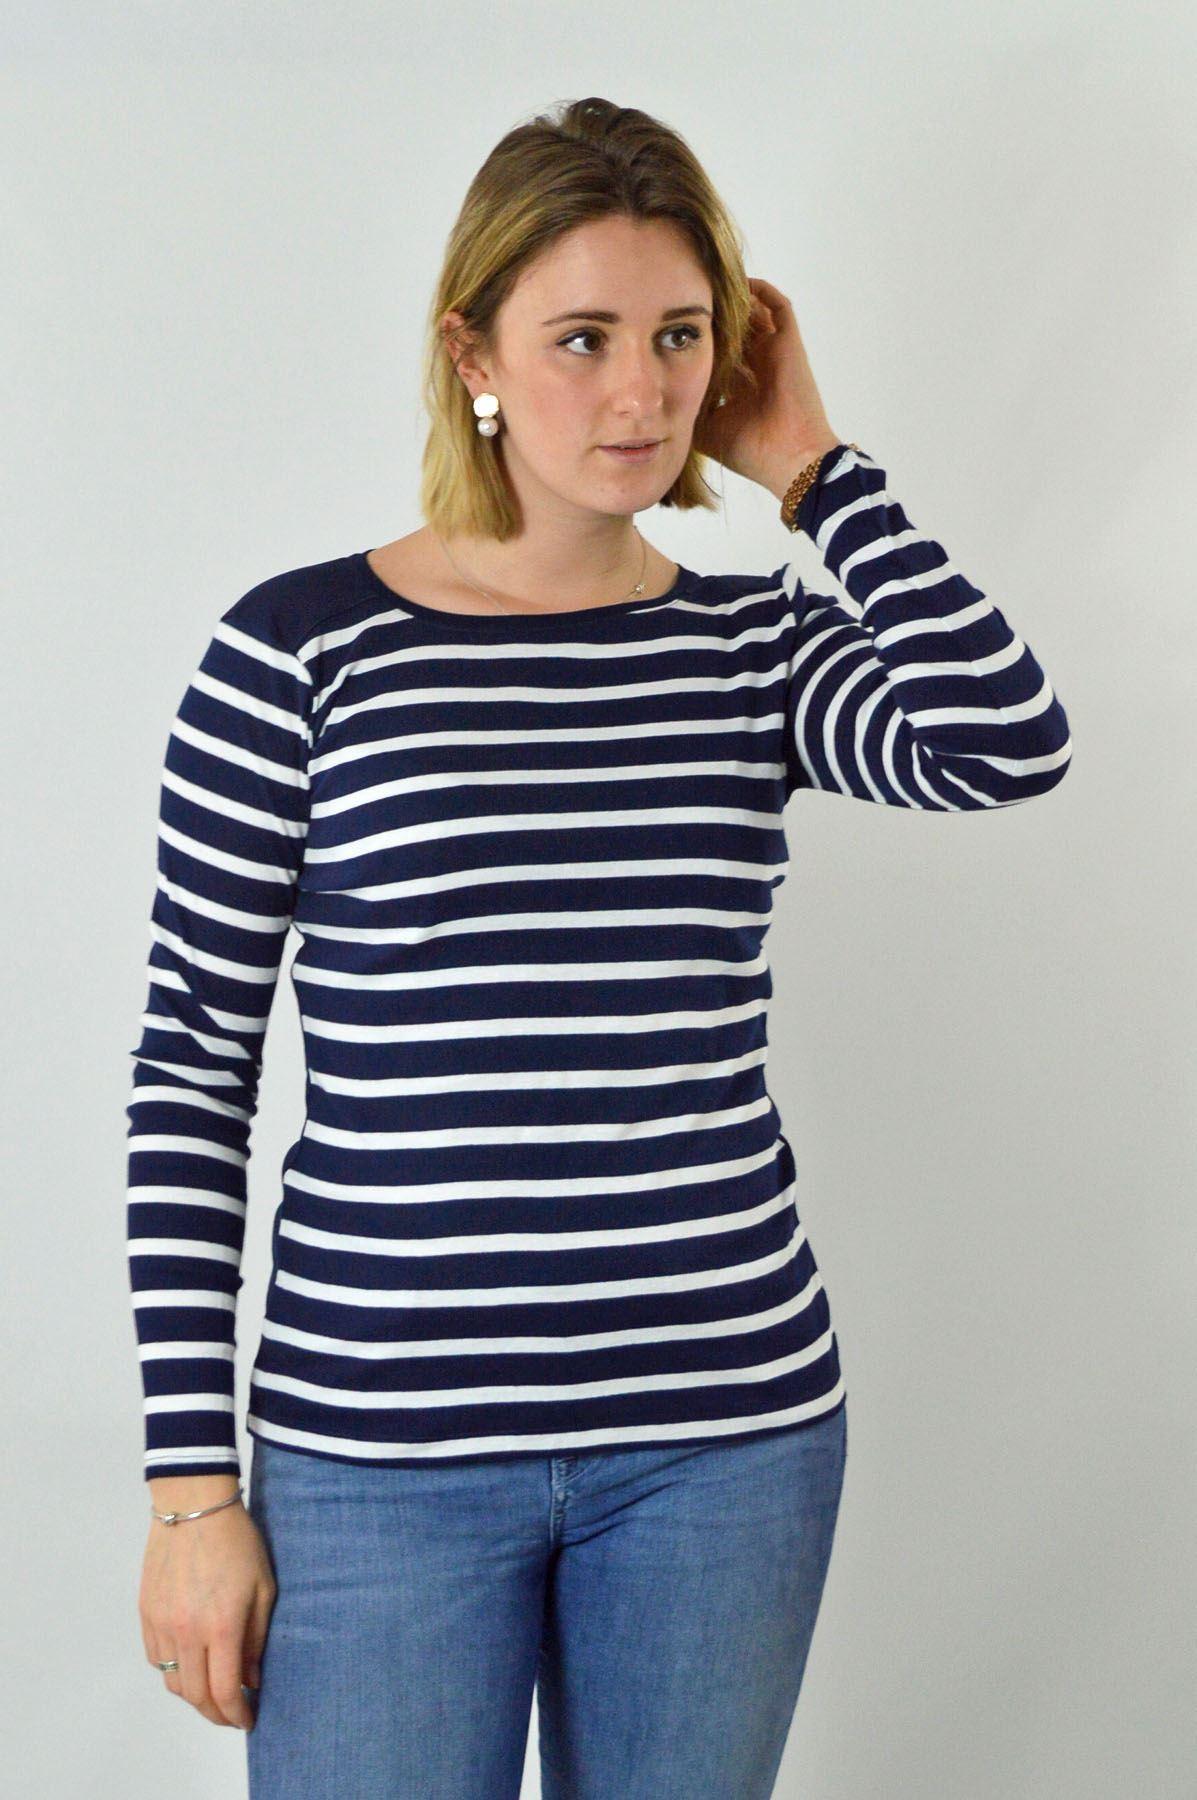 Womens-Crew-Neck-Navy-Black-White-Striped-Jersey-Top-Long-Sleeve-T-Shirt thumbnail 11